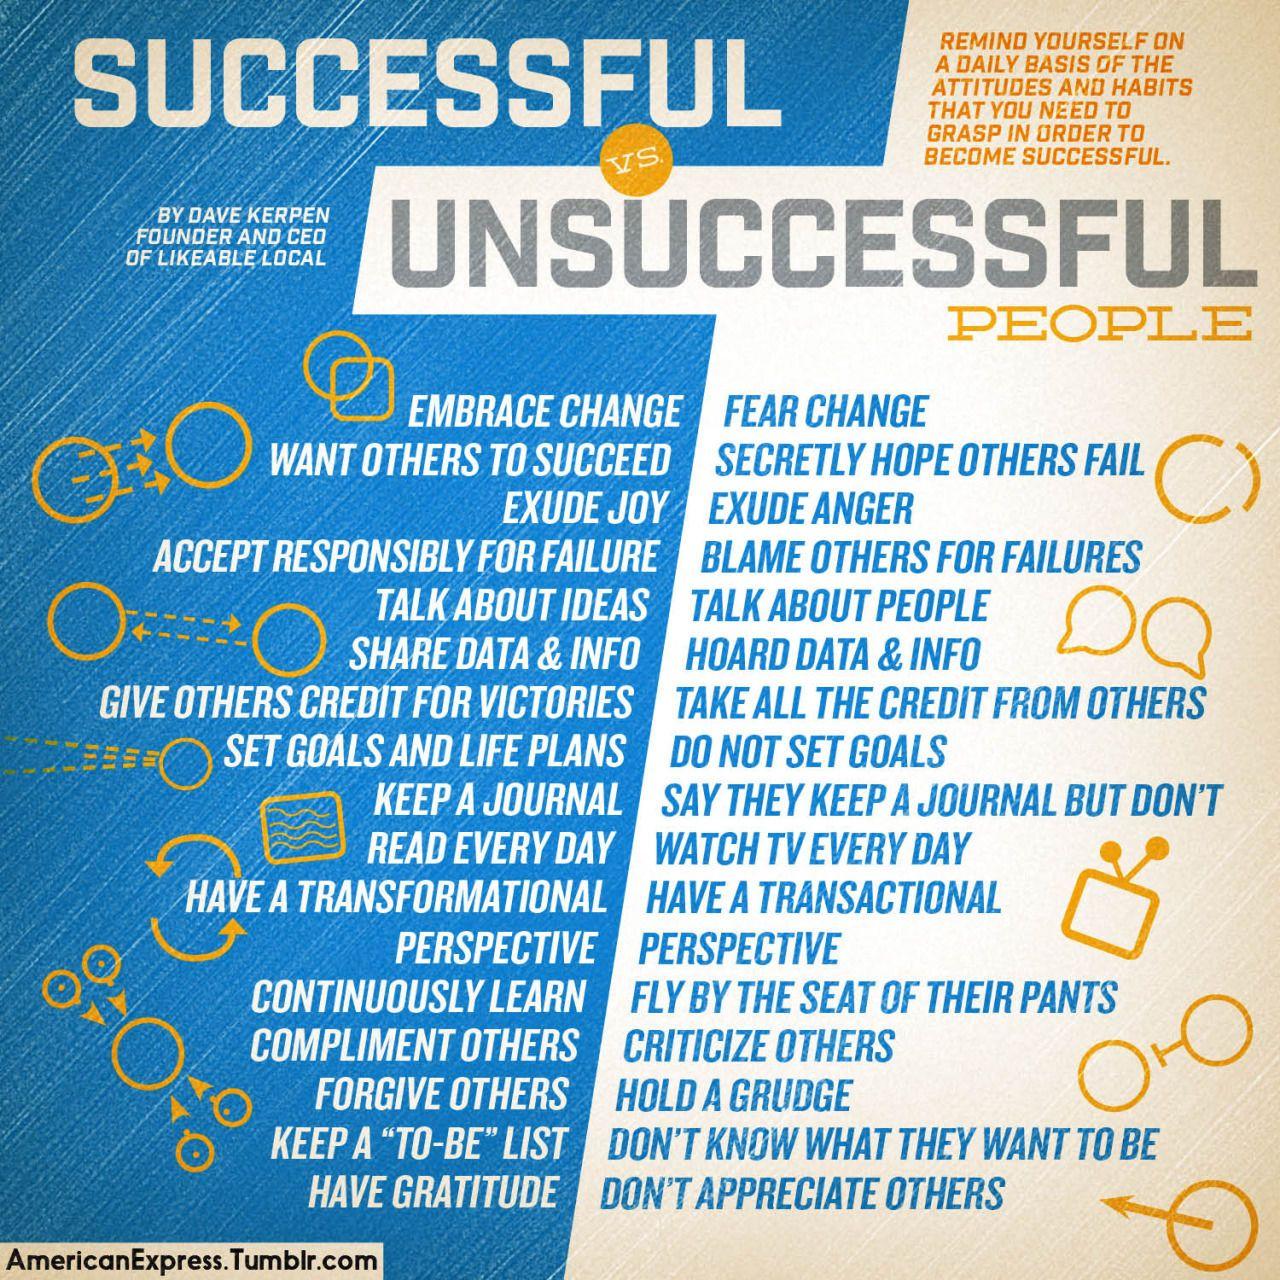 Success And Unsuccess Quotes: Successful Vs Unsuccessful People Success Business Succeed